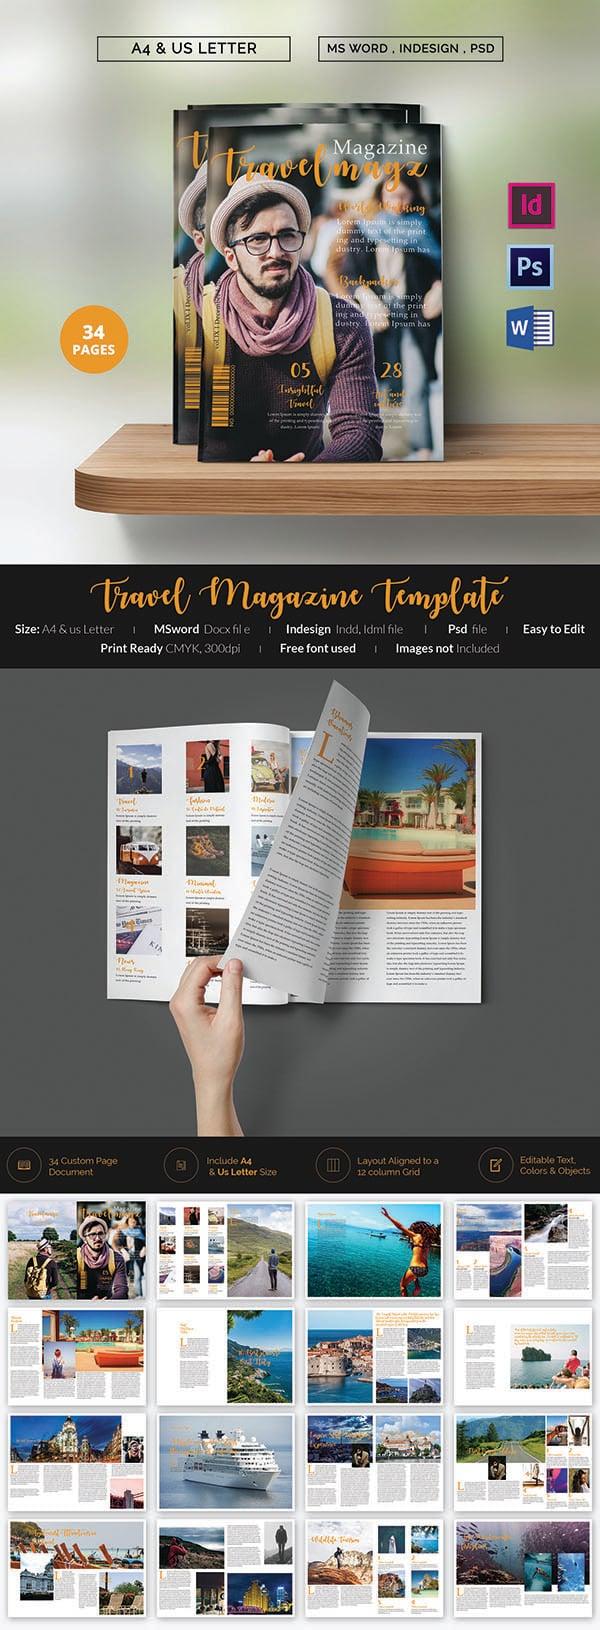 brand new magazine templates word psd eps ai creative travel agency magazine